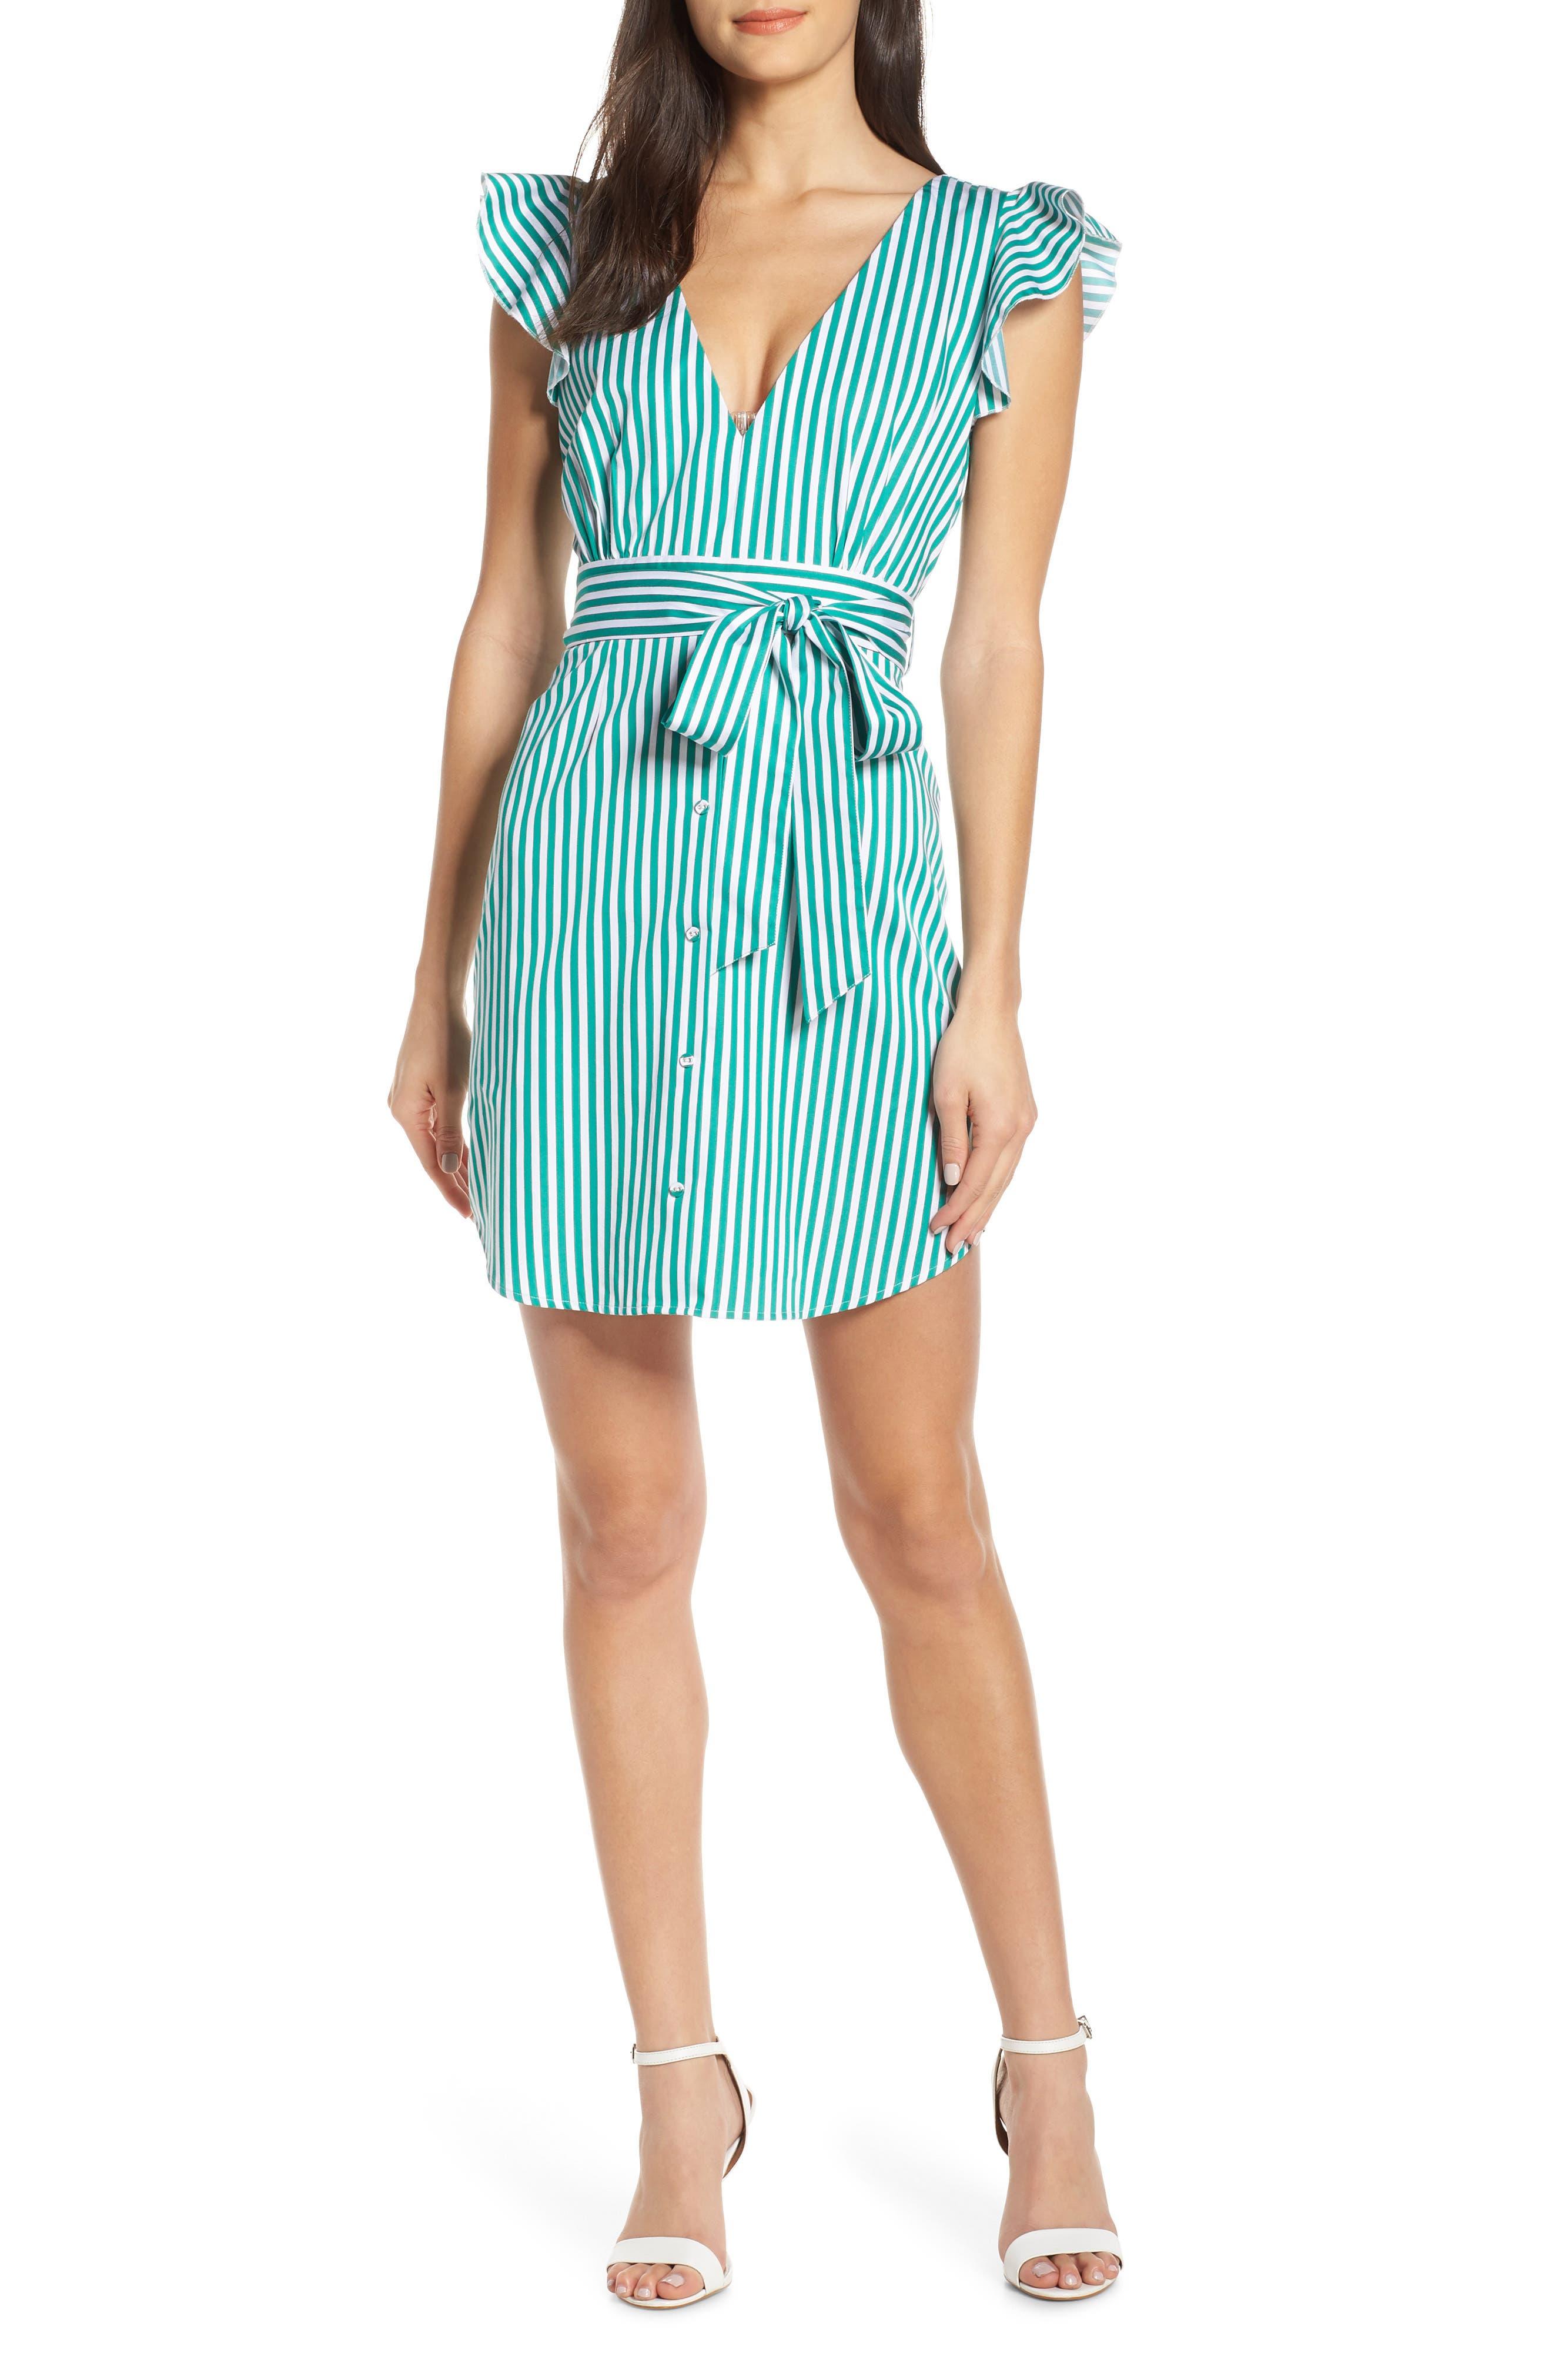 a8176a46764 Bb Dakota Peppermint Stripe Dress